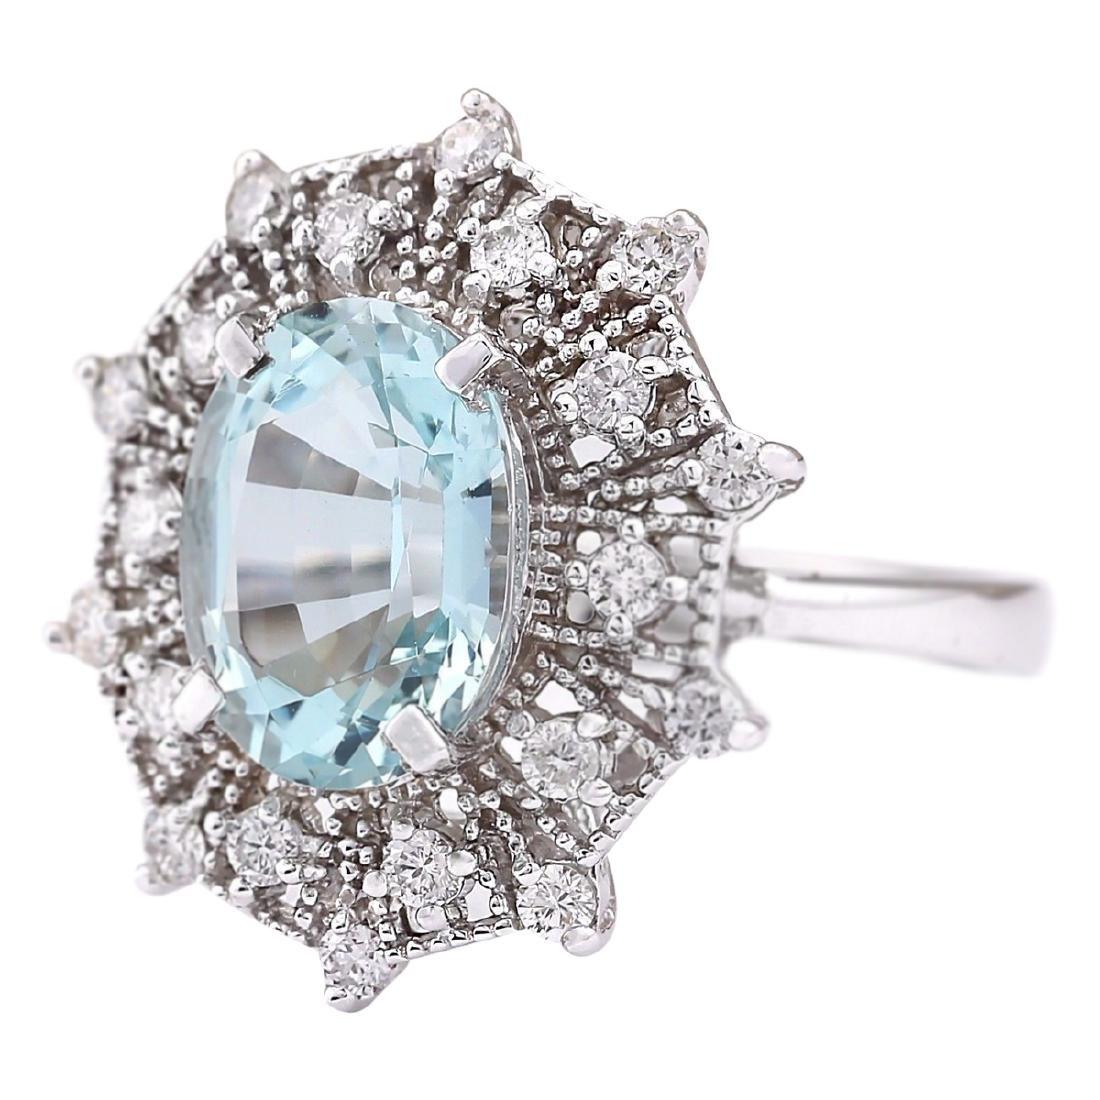 4.32 CTW Natural Aquamarine And Diamond Ring In 18K - 2